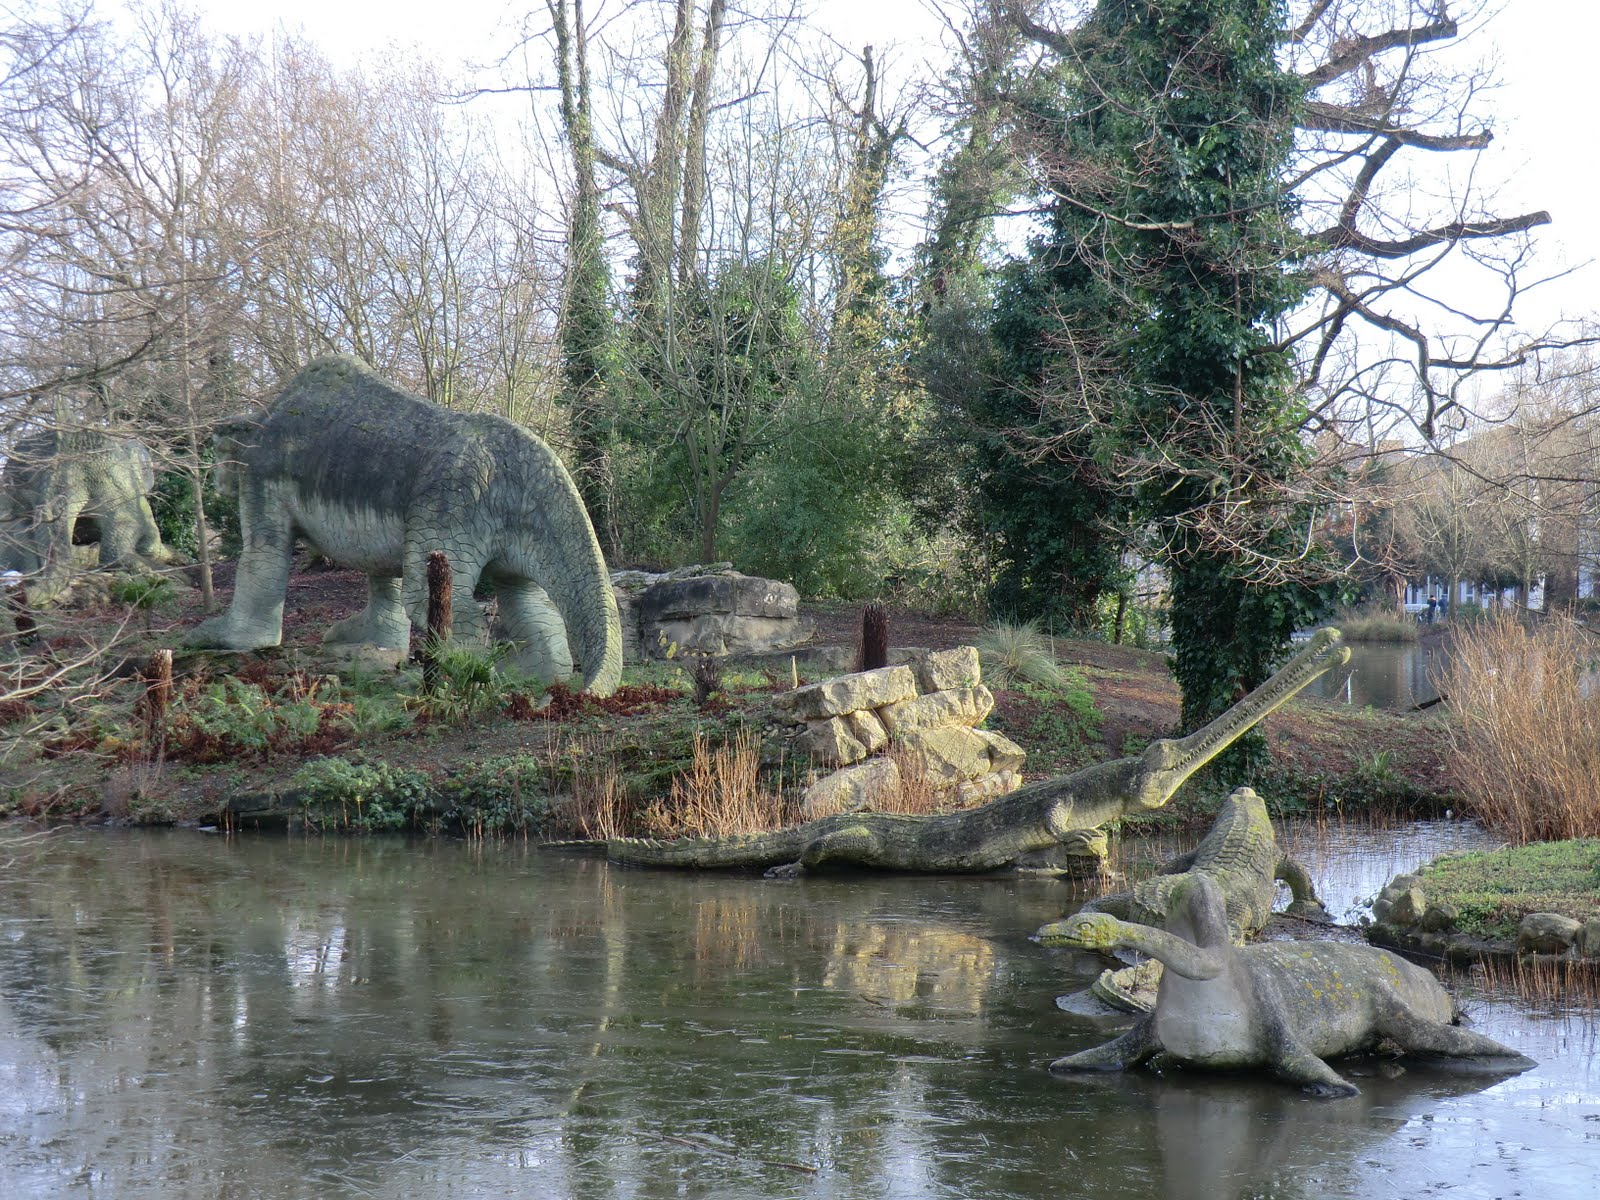 CIMG9764 Megalosaurus & Teleosaurus, Crystal Palace Park